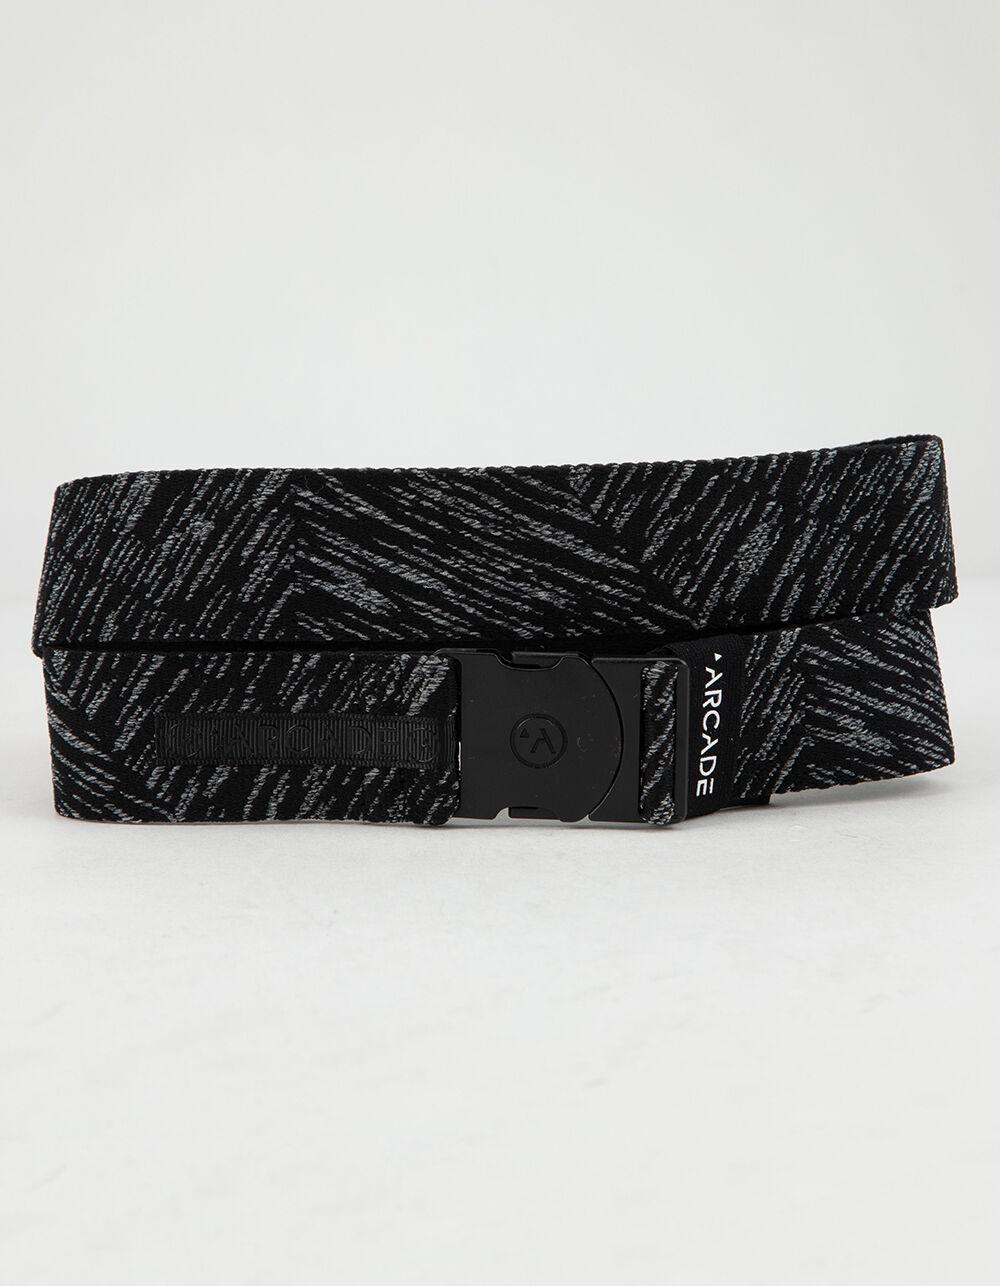 Image of ARCADE THE FOUNDATION BLACK & GRAY BELT